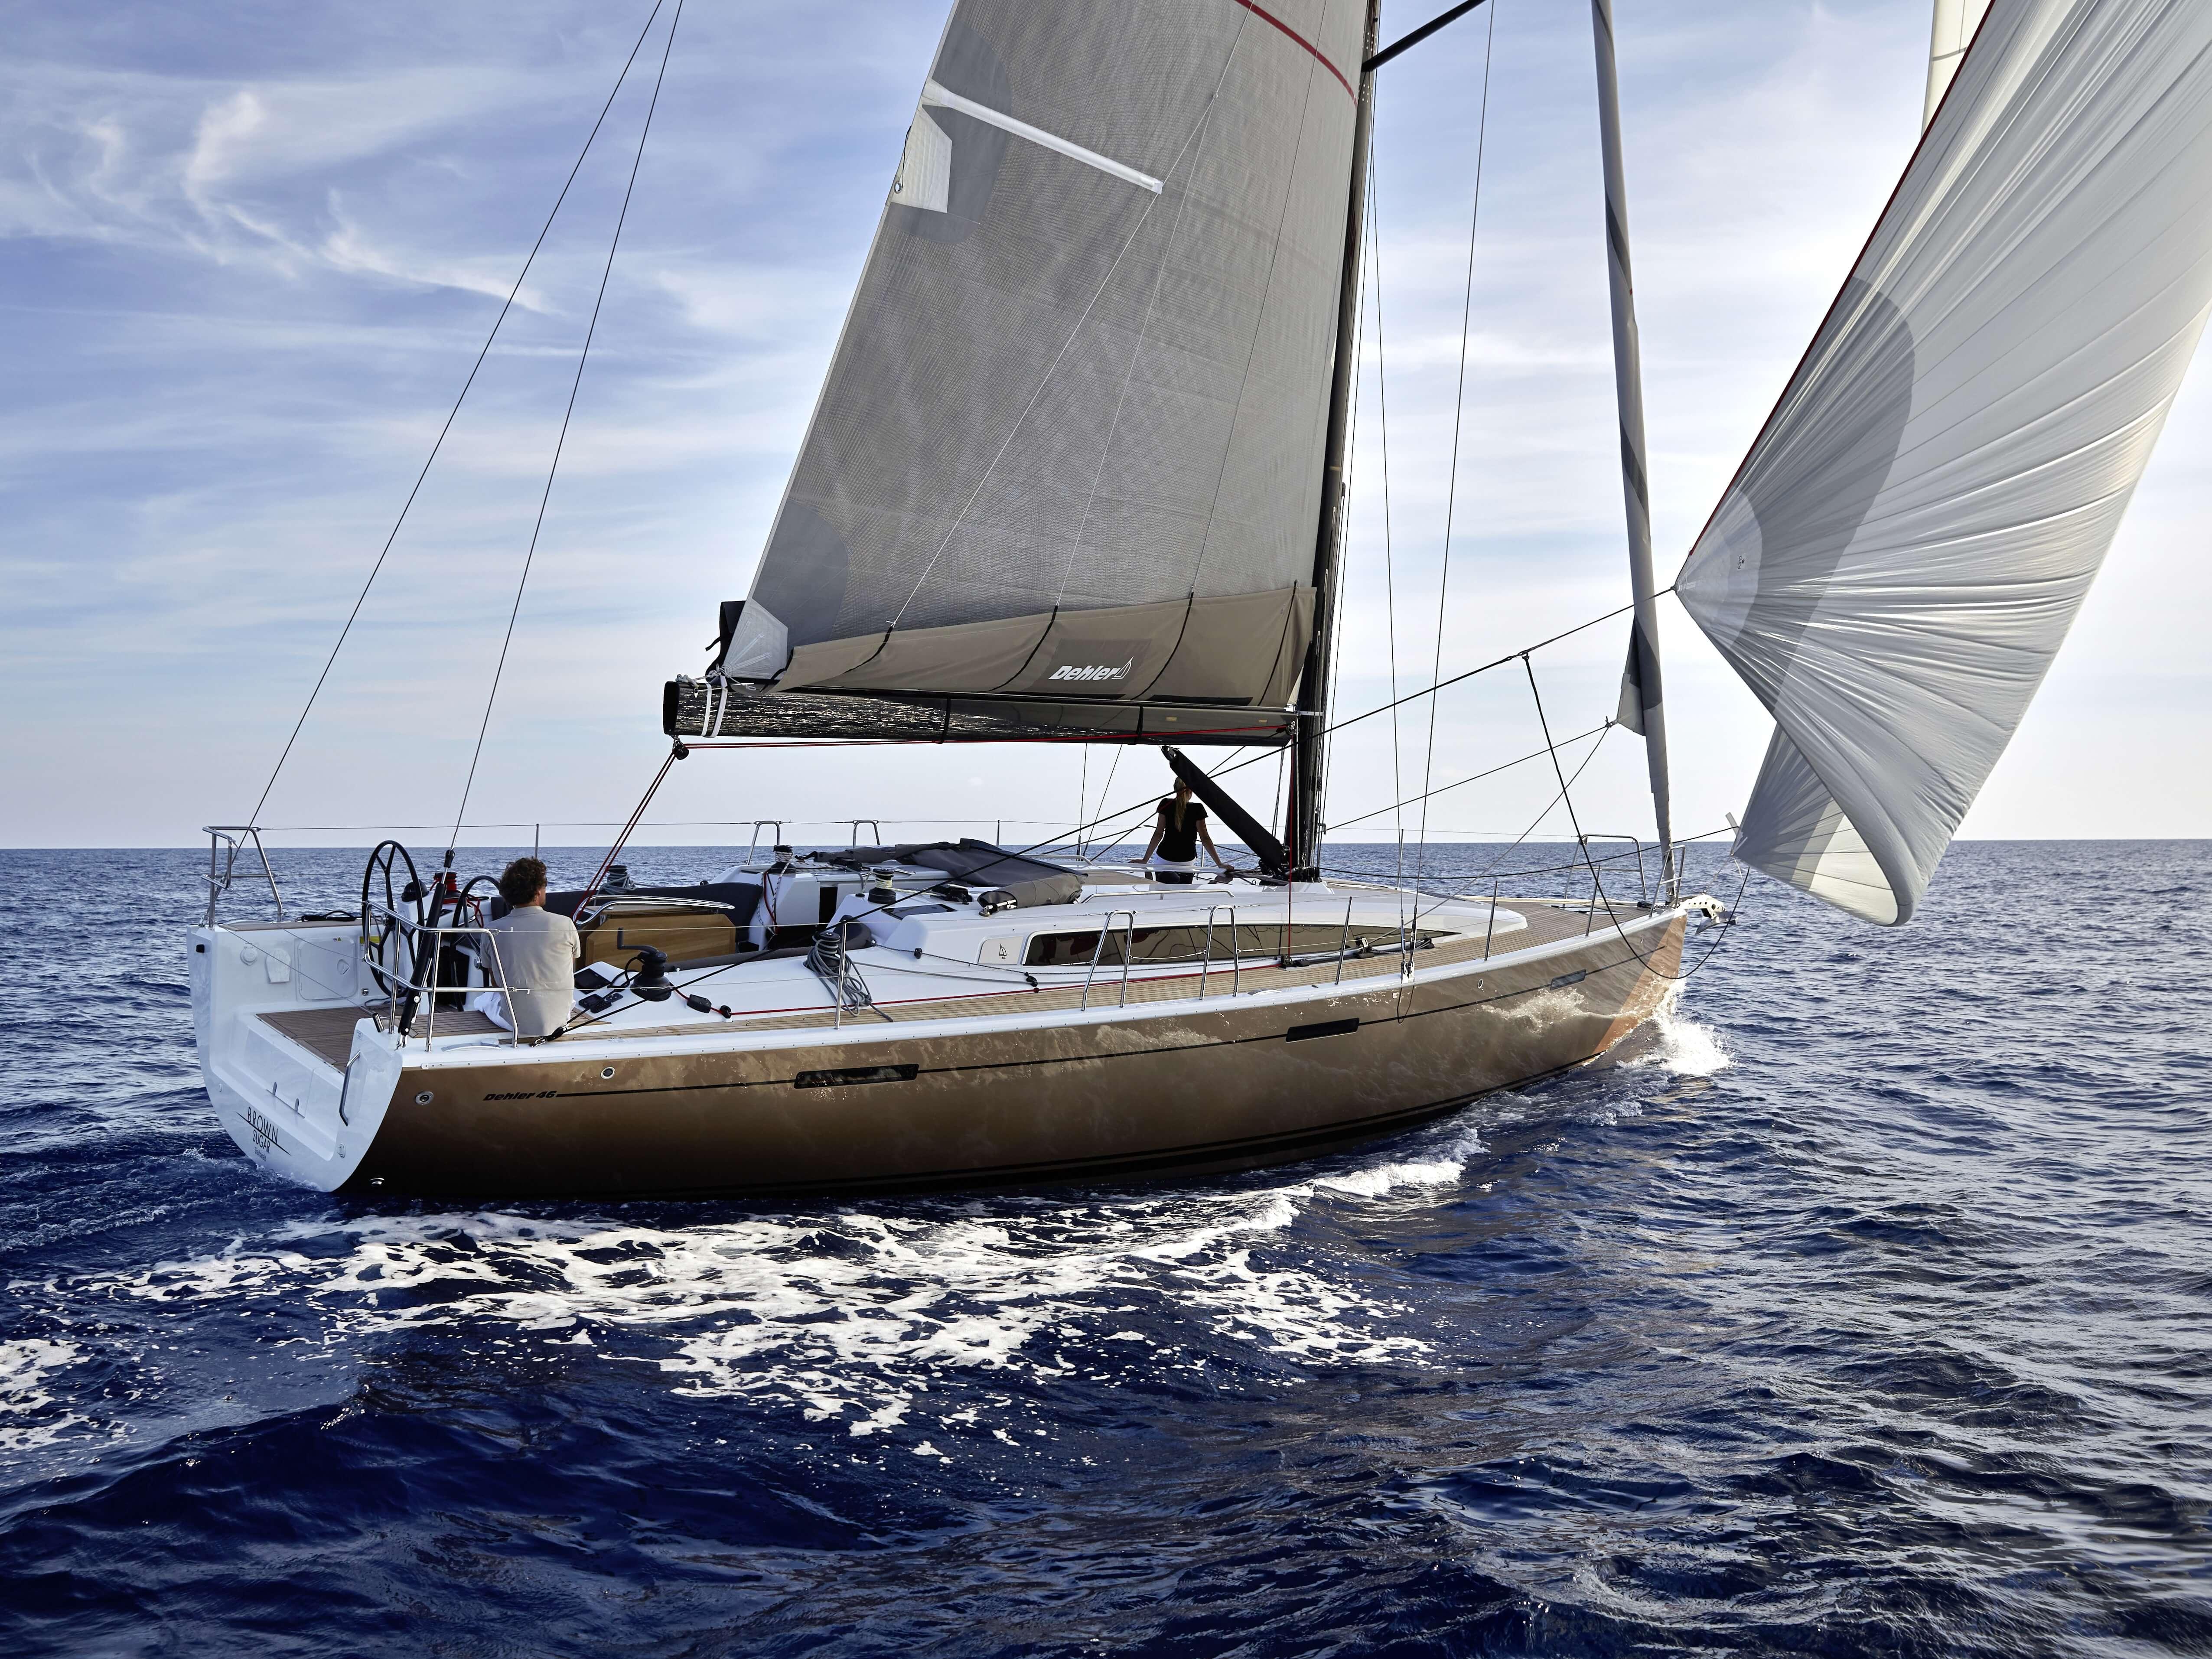 Dehler 46 Exterior Sailing | Gennaker, mainsail, hull | Dehler